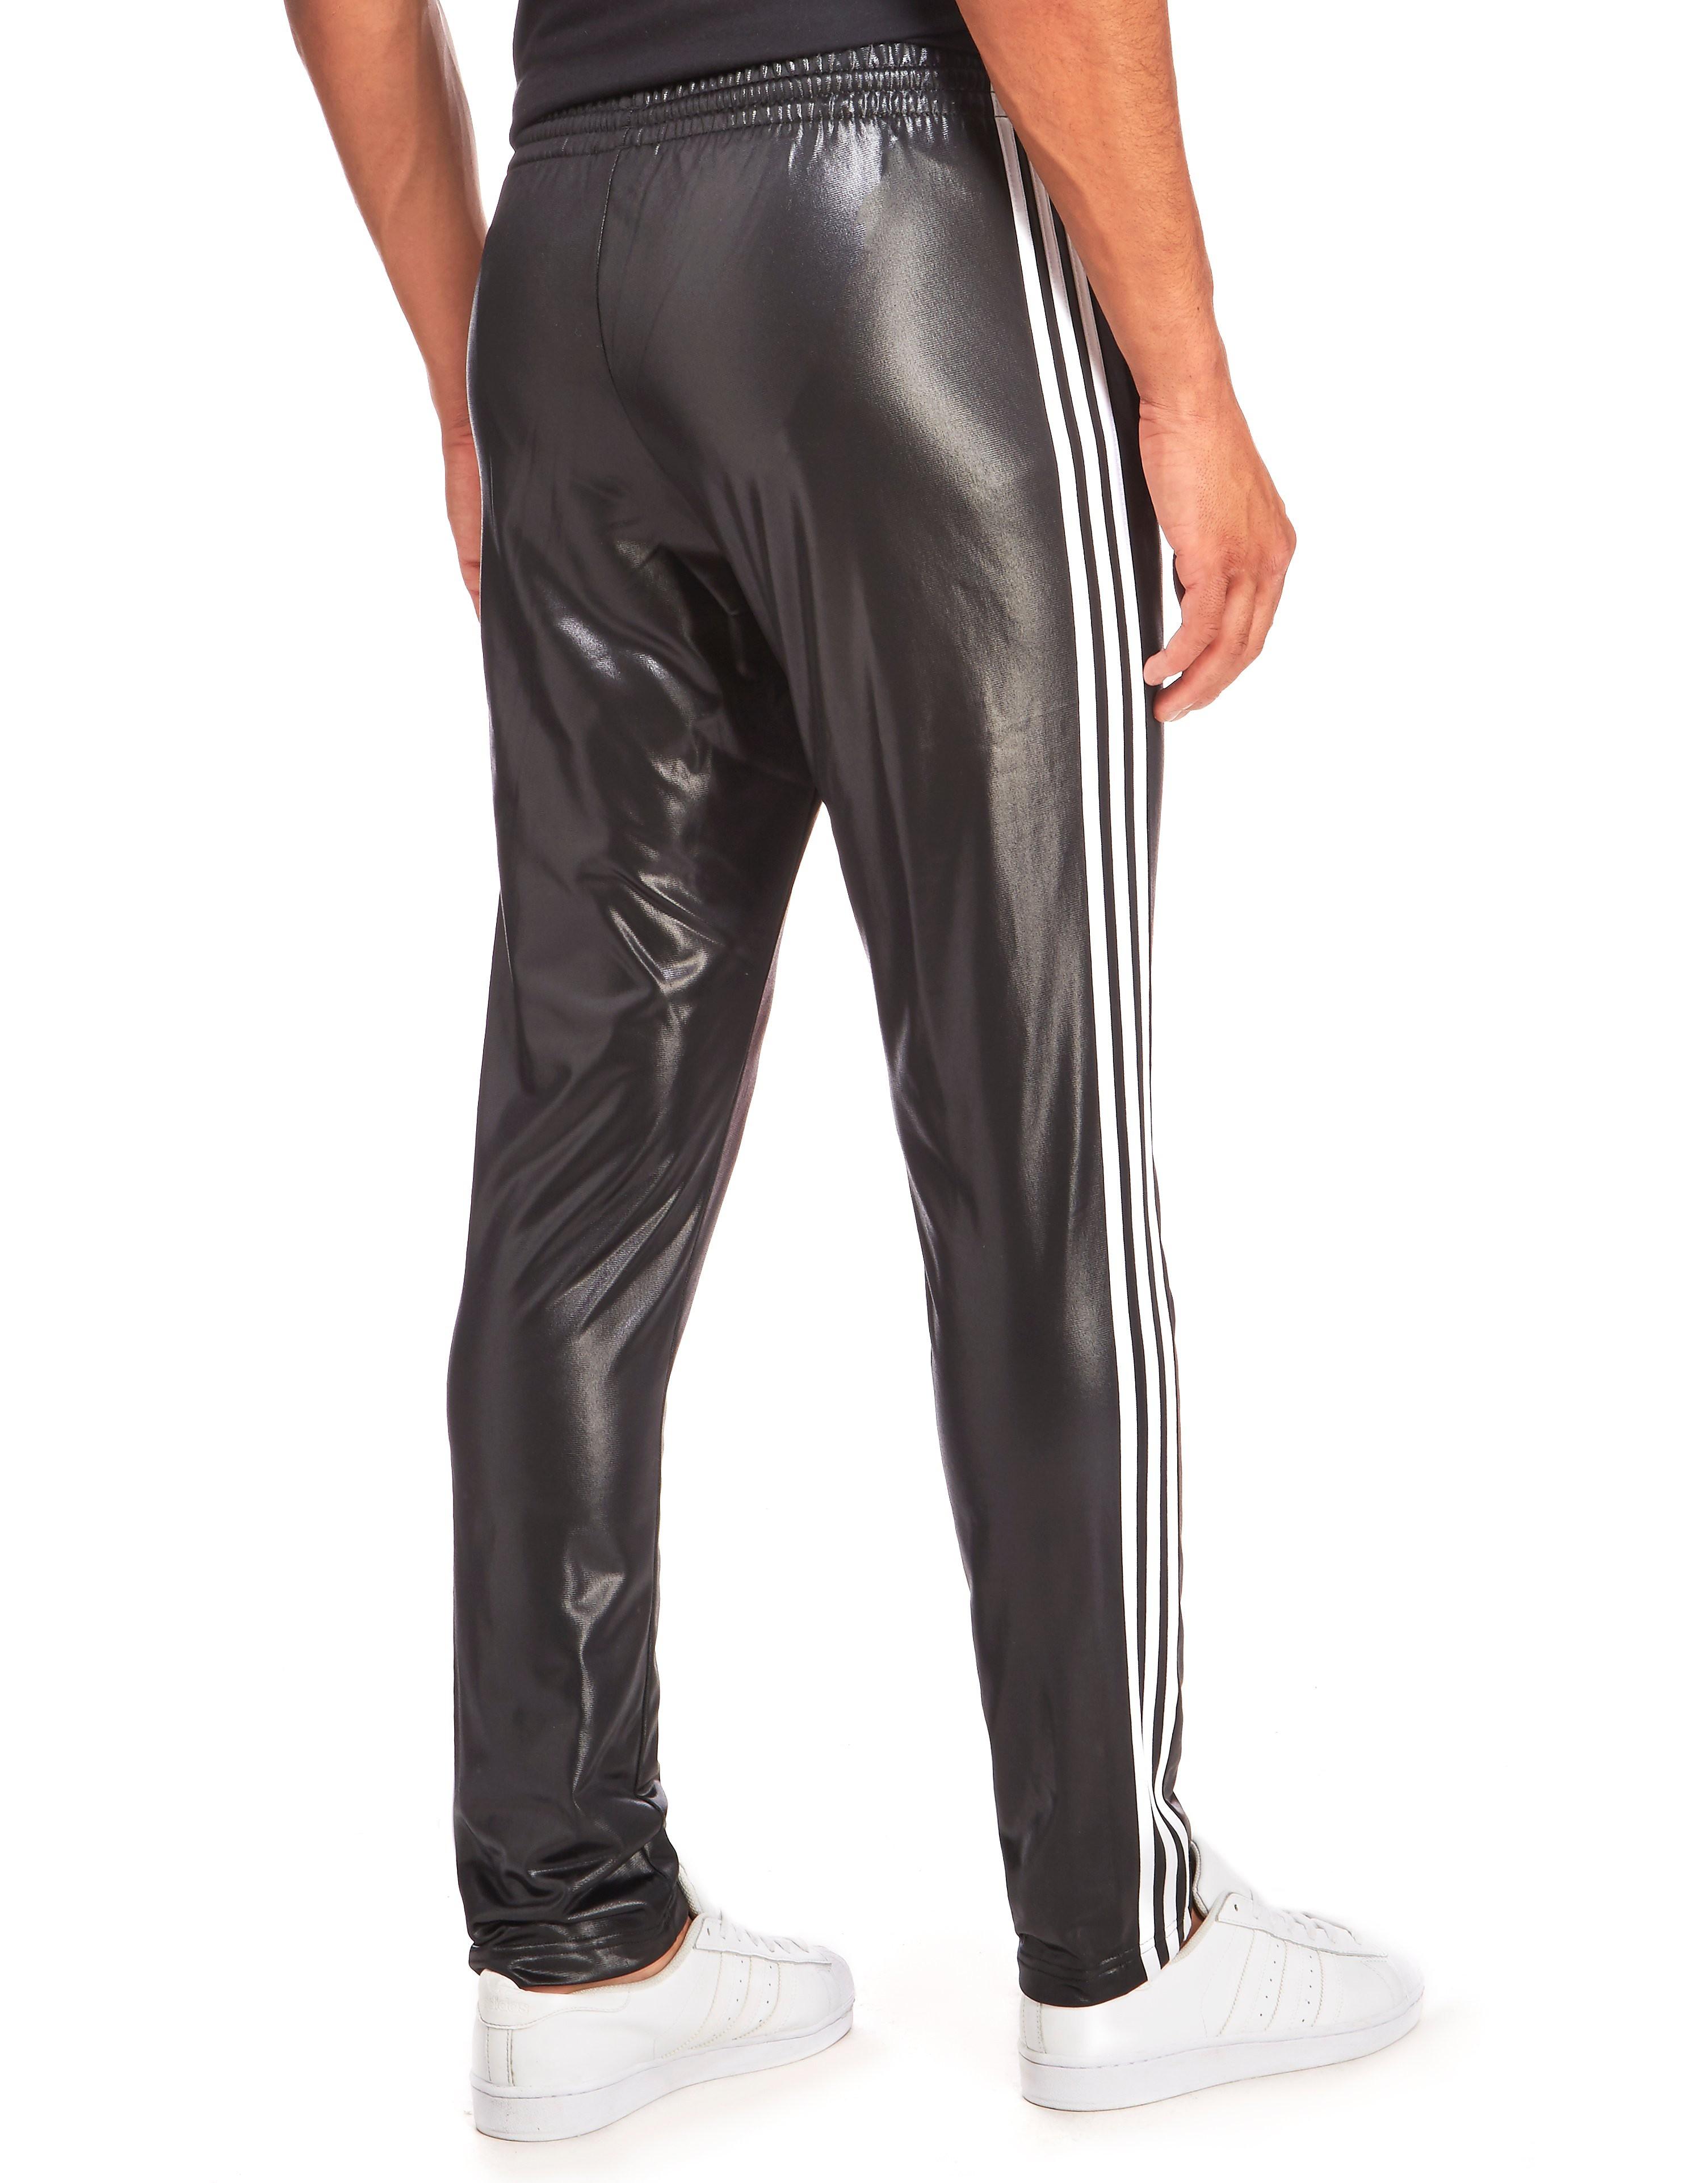 adidas Originals Chile Cuff Poly Pants